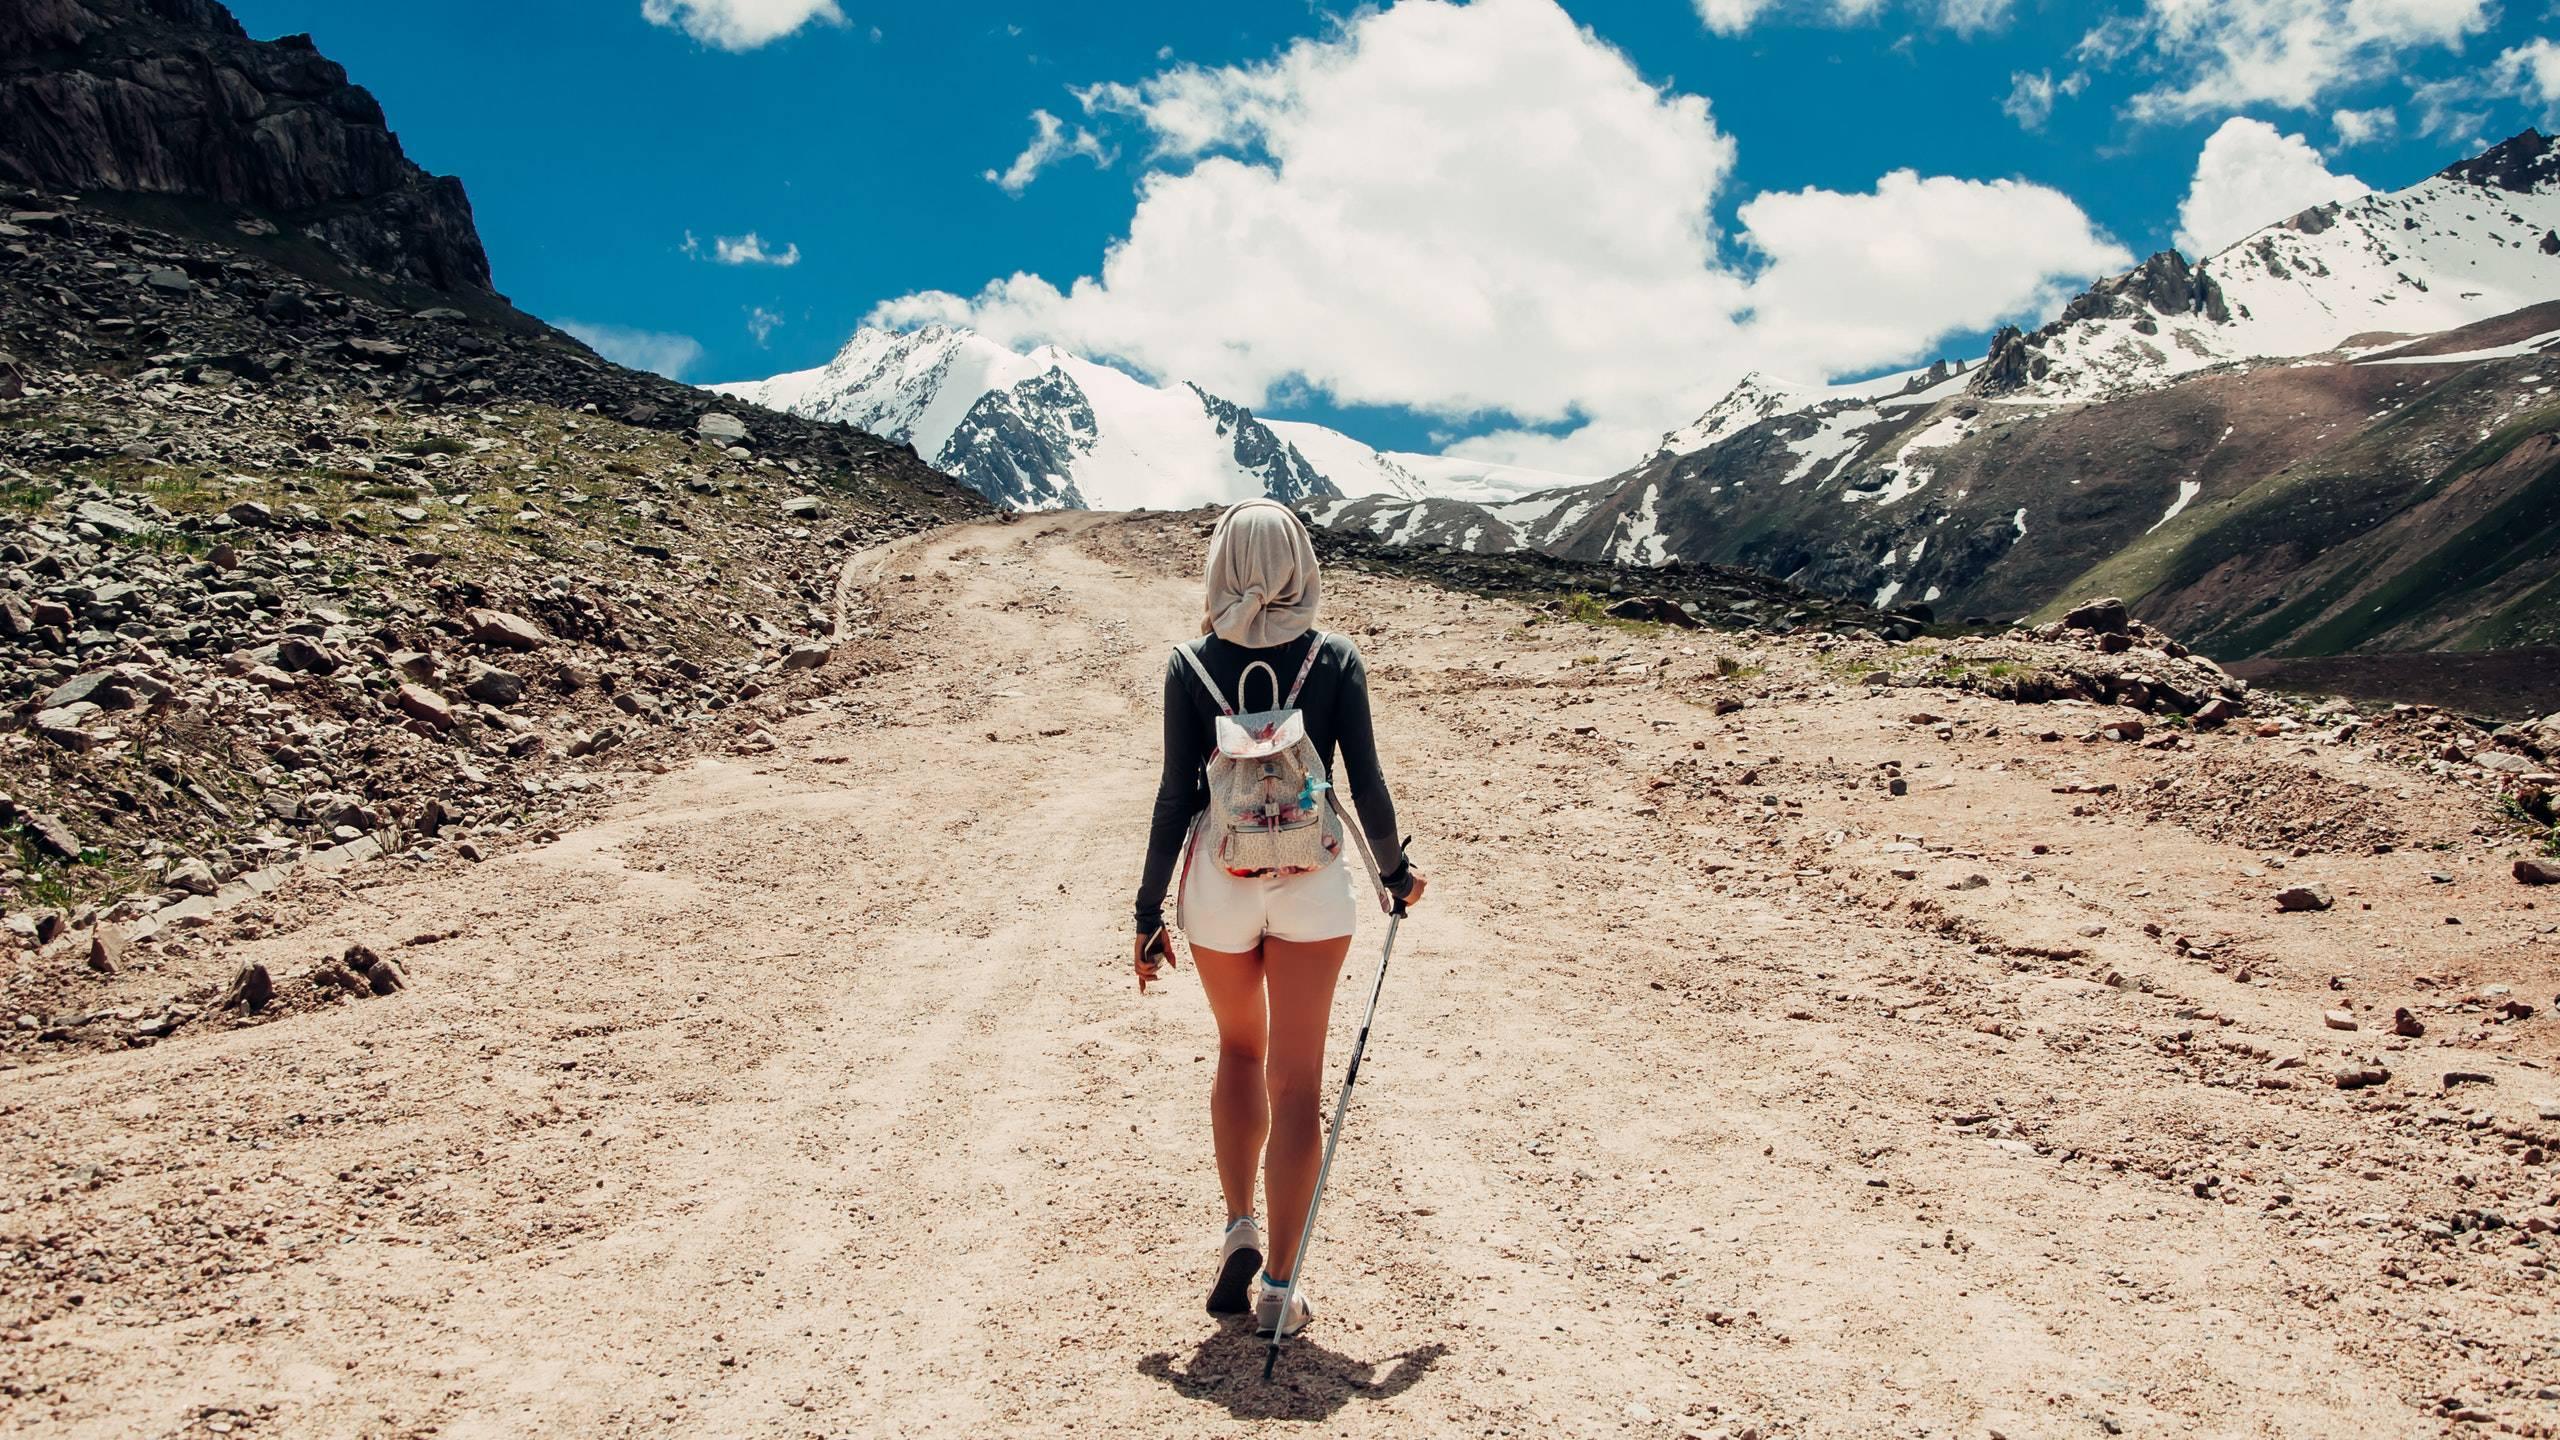 Hotel-Togo-Palace-Terminillo-Rieti-activities-hiking2